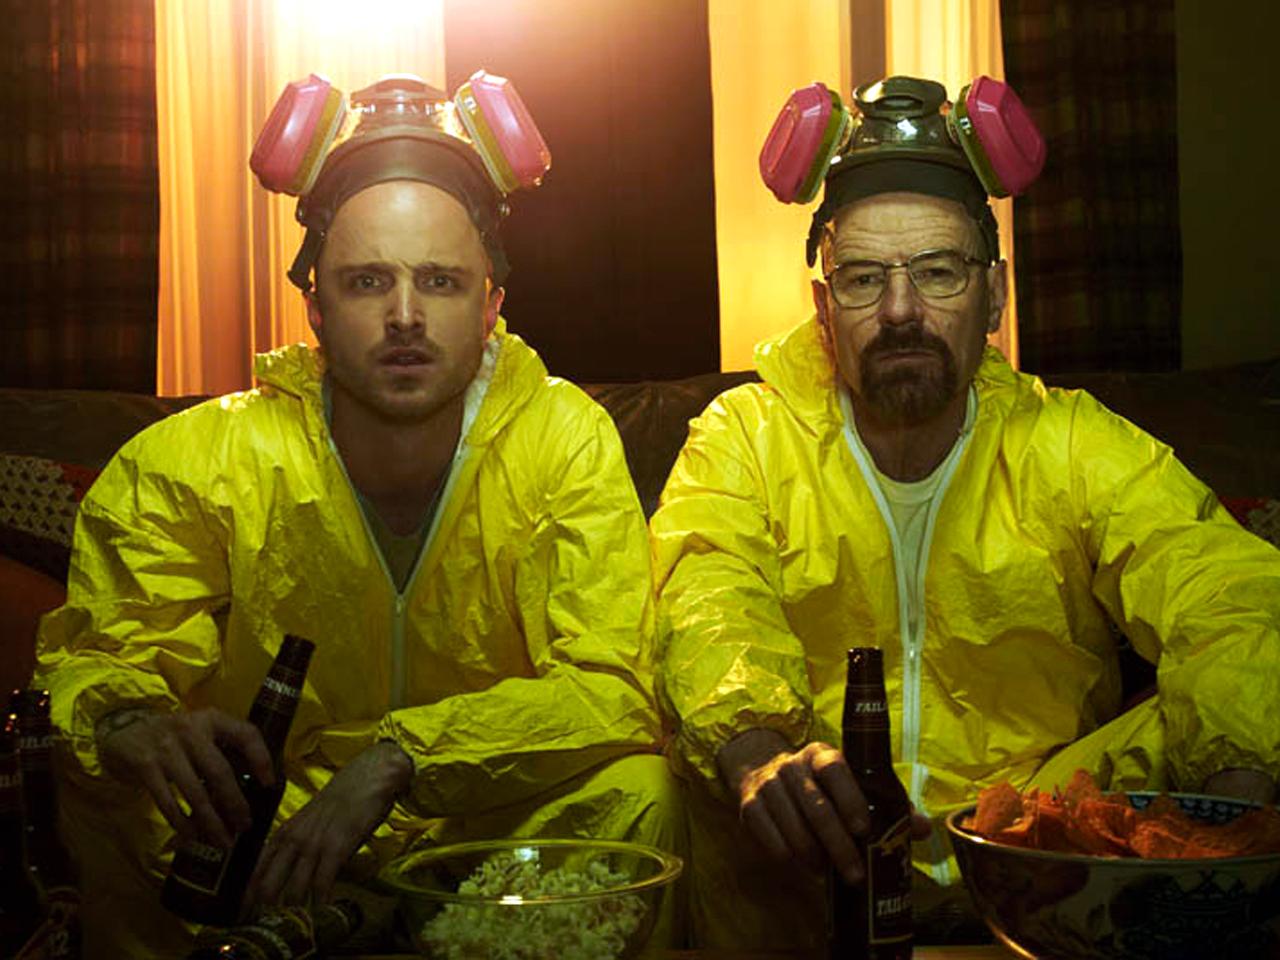 Breaking Bad Season 5 Cast Photos Jesse Pinkman (Aaron Paul) and Walter White (Bryan Cranston)